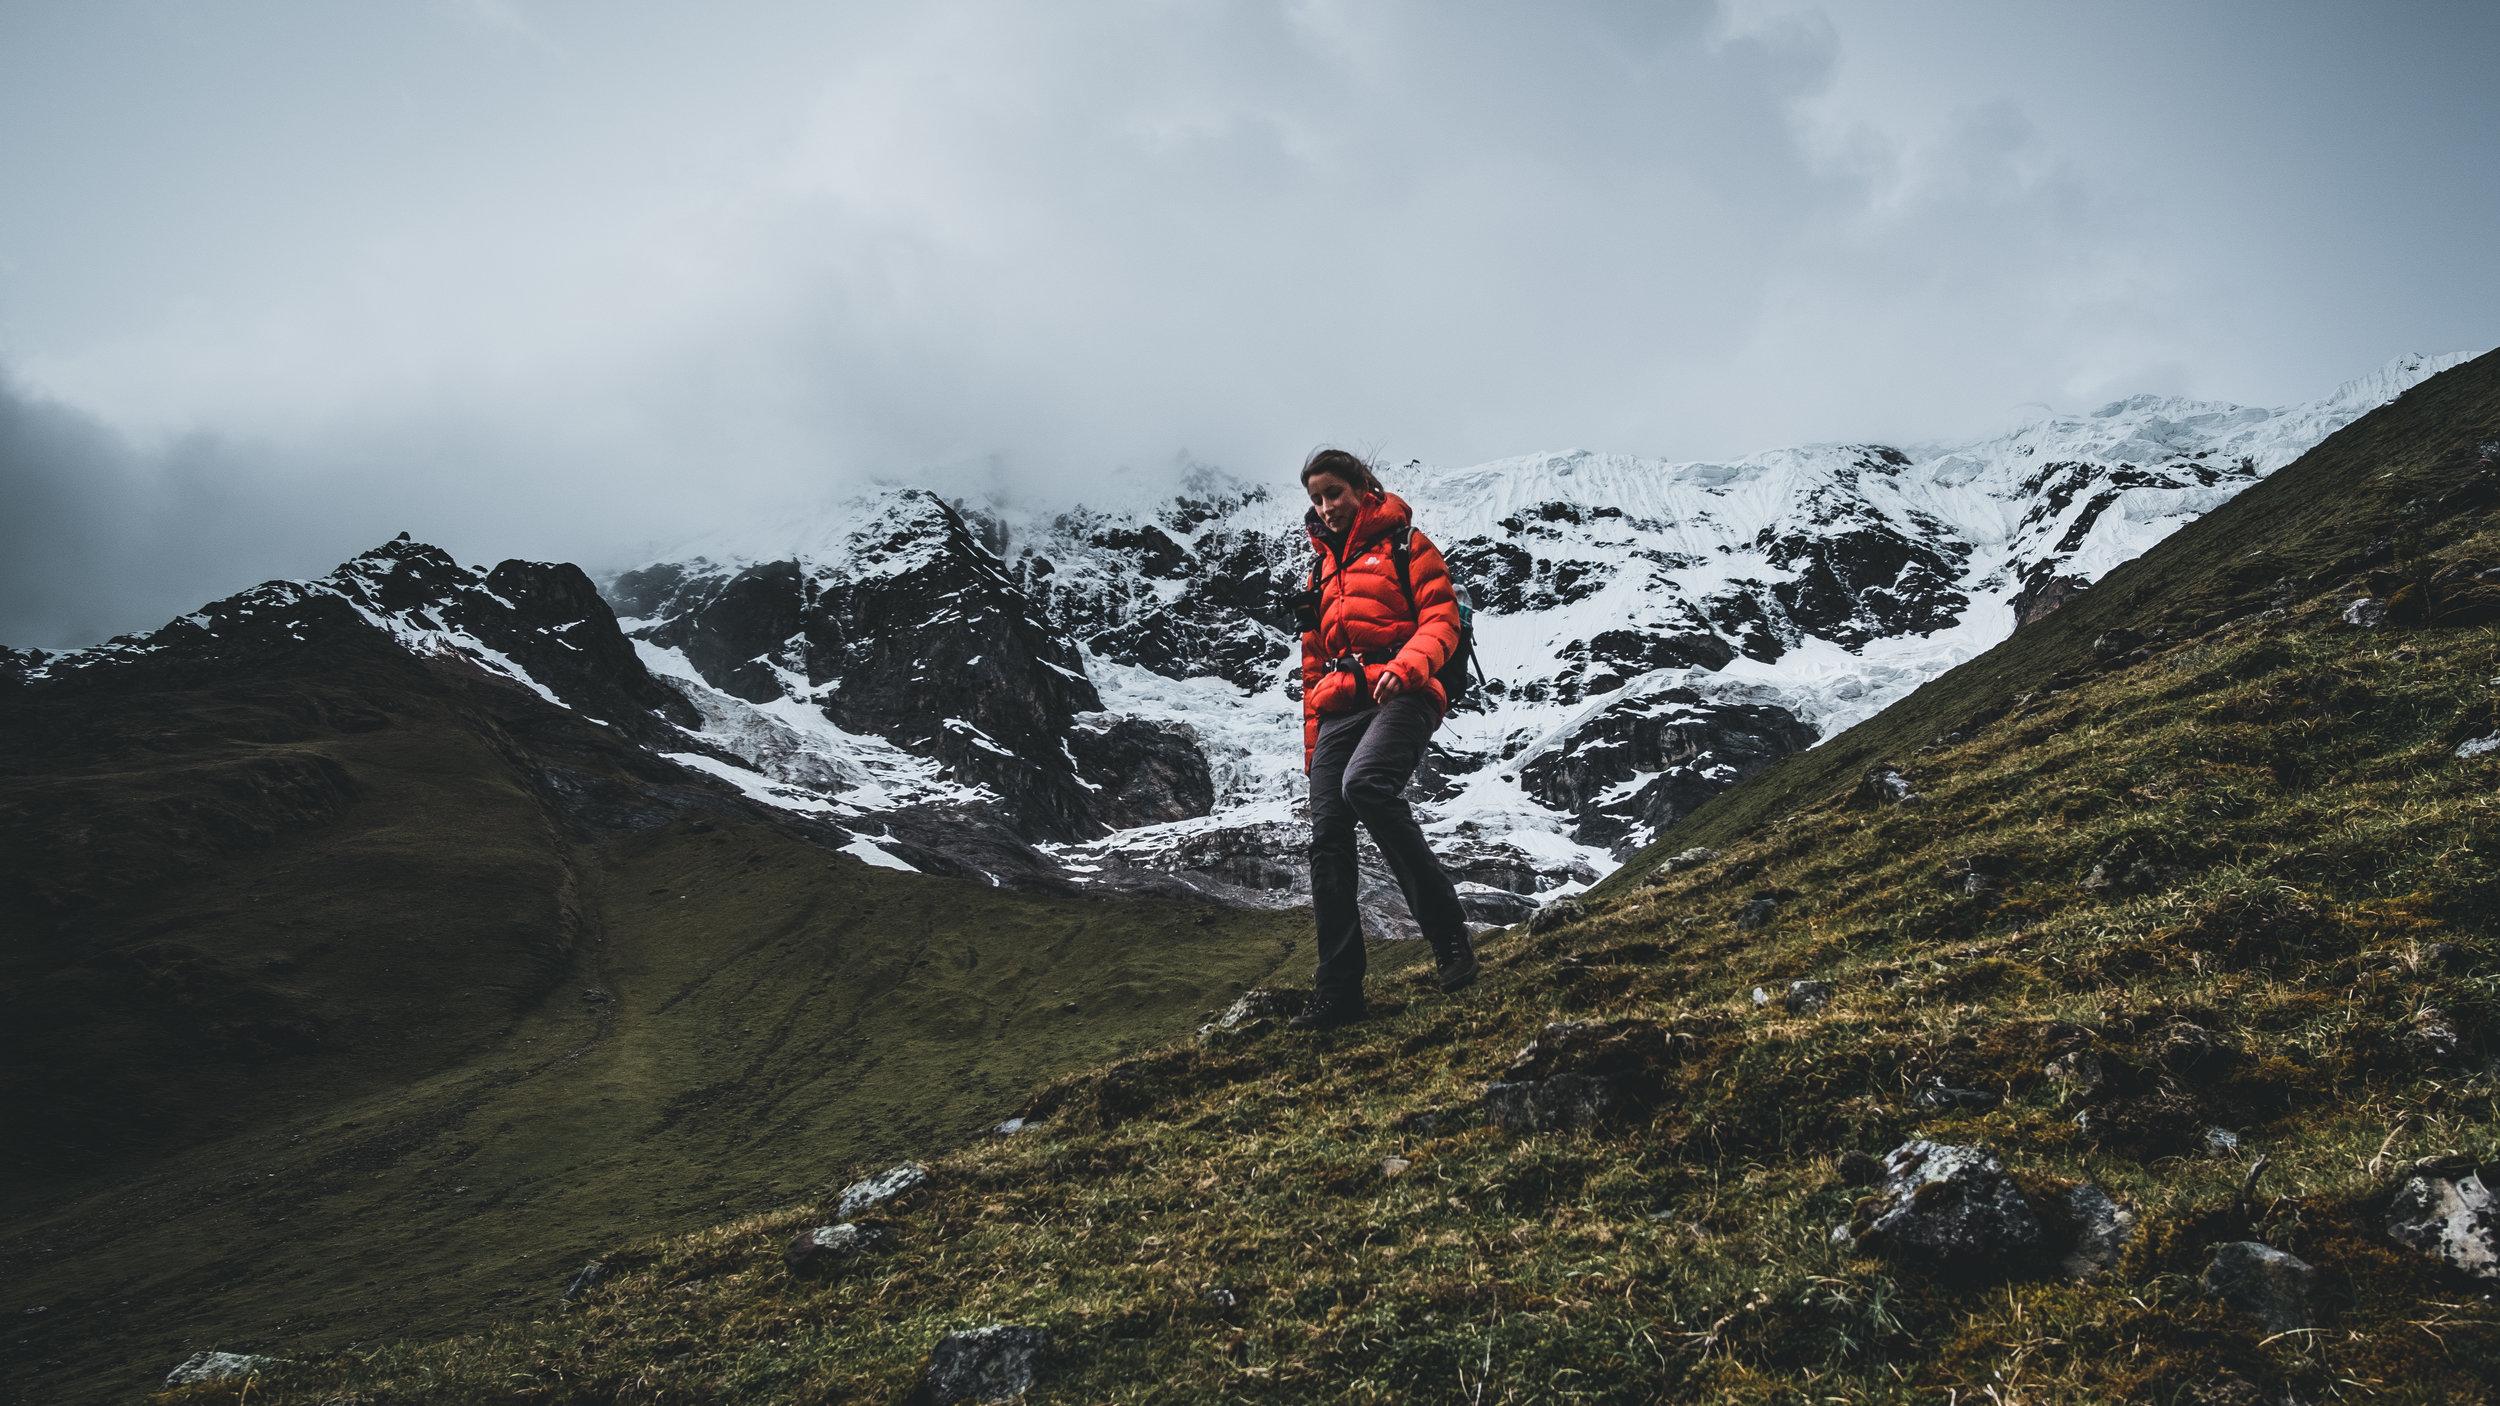 Hike in front of 6000 m peaks | Cordillera Vilcabamba